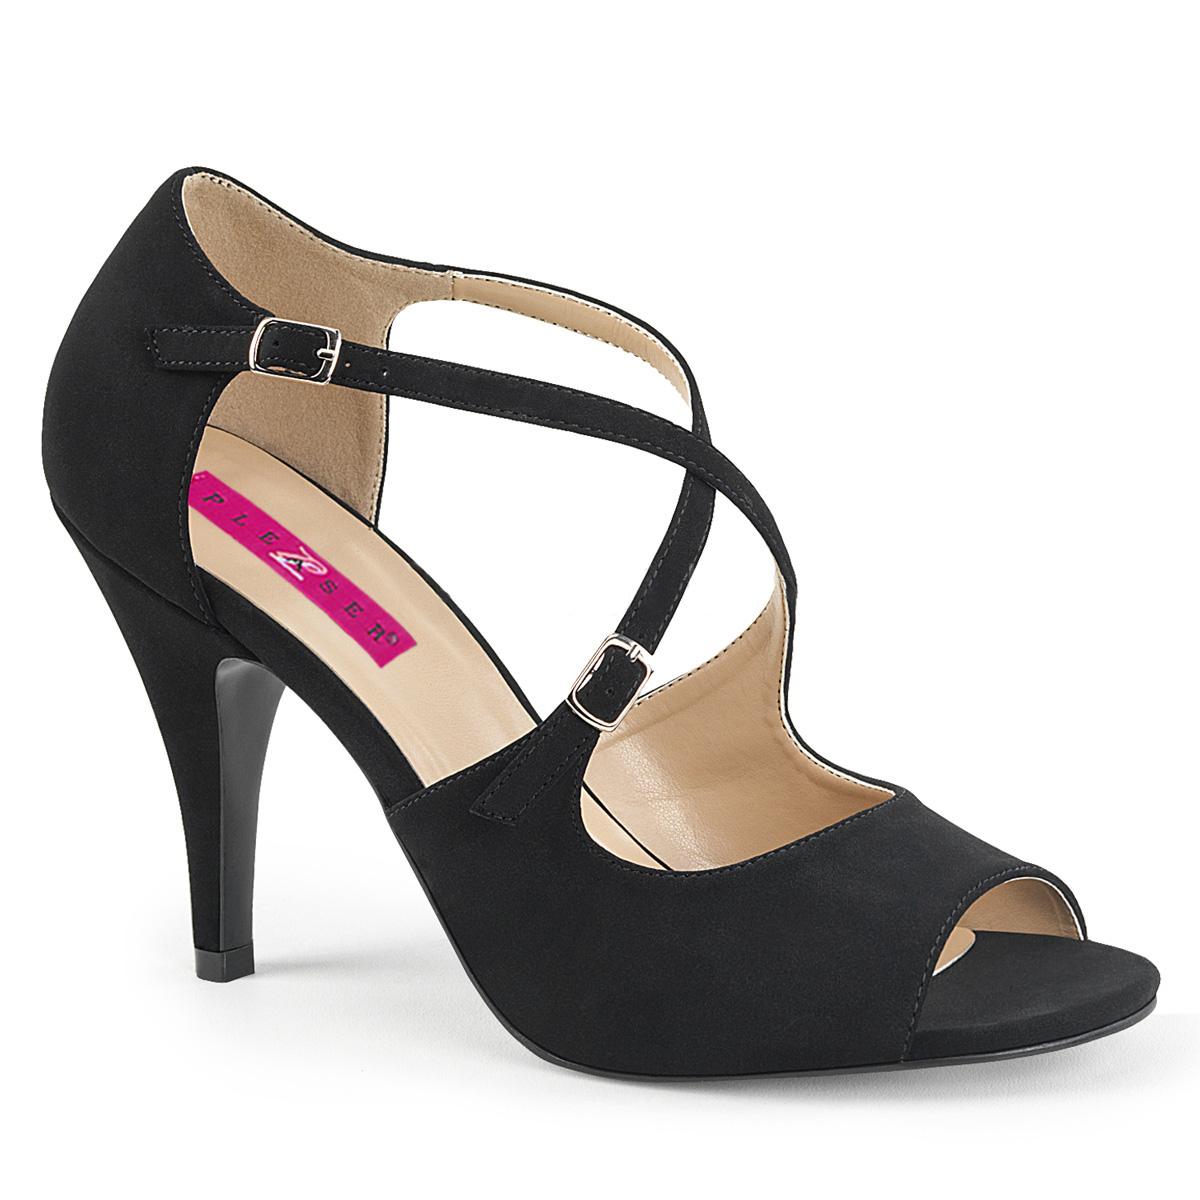 412 SchwarzPleaser Dream Sandalette Pink Label Peeptoe exBoCd